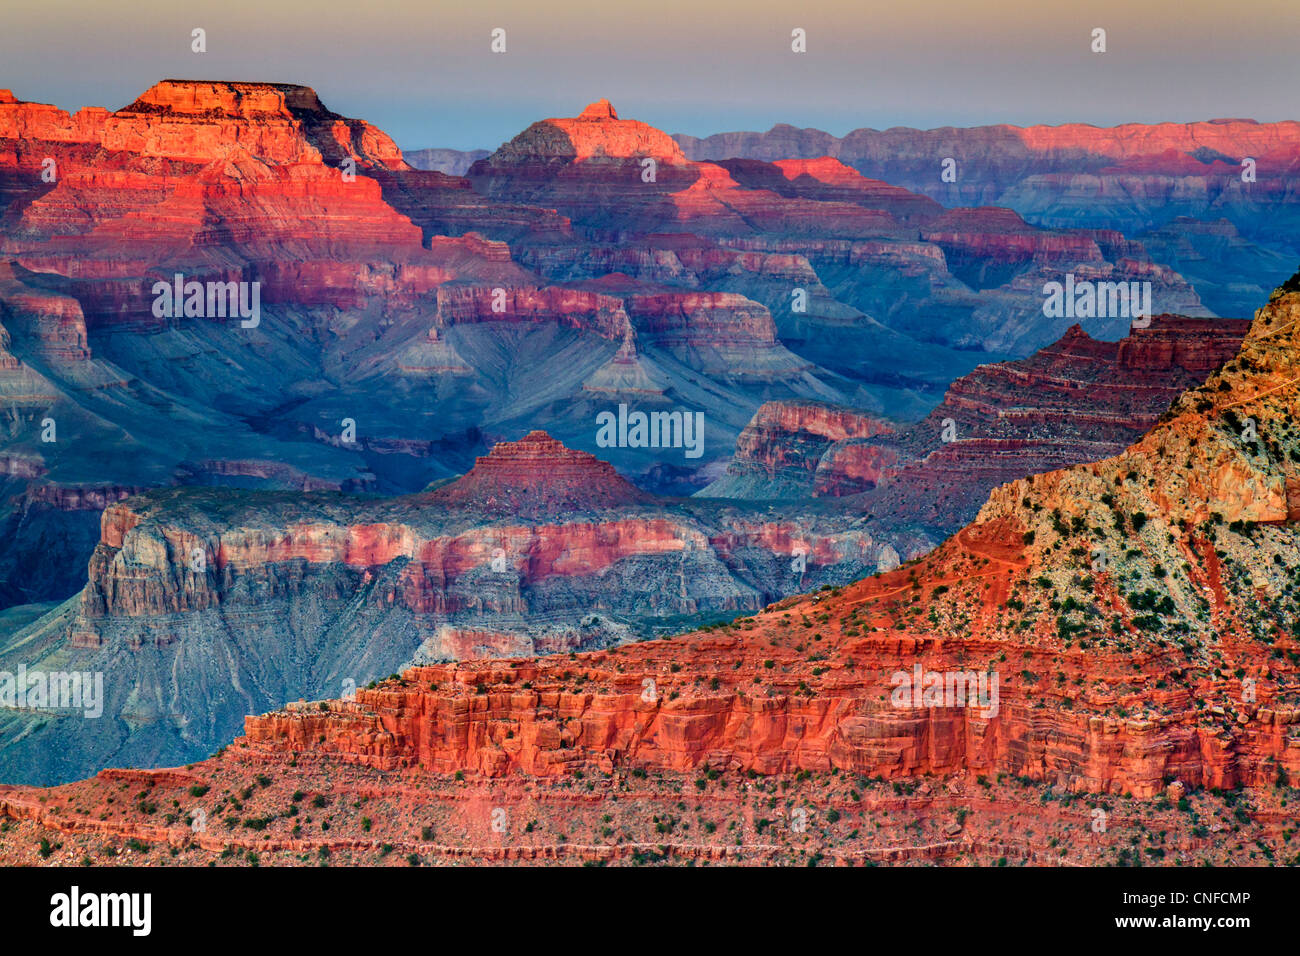 Sonnenuntergang auf Mutter Punkt, South Rim, Grand Canyon National Park (Arizona, USA). HDR-Technik. Stockfoto